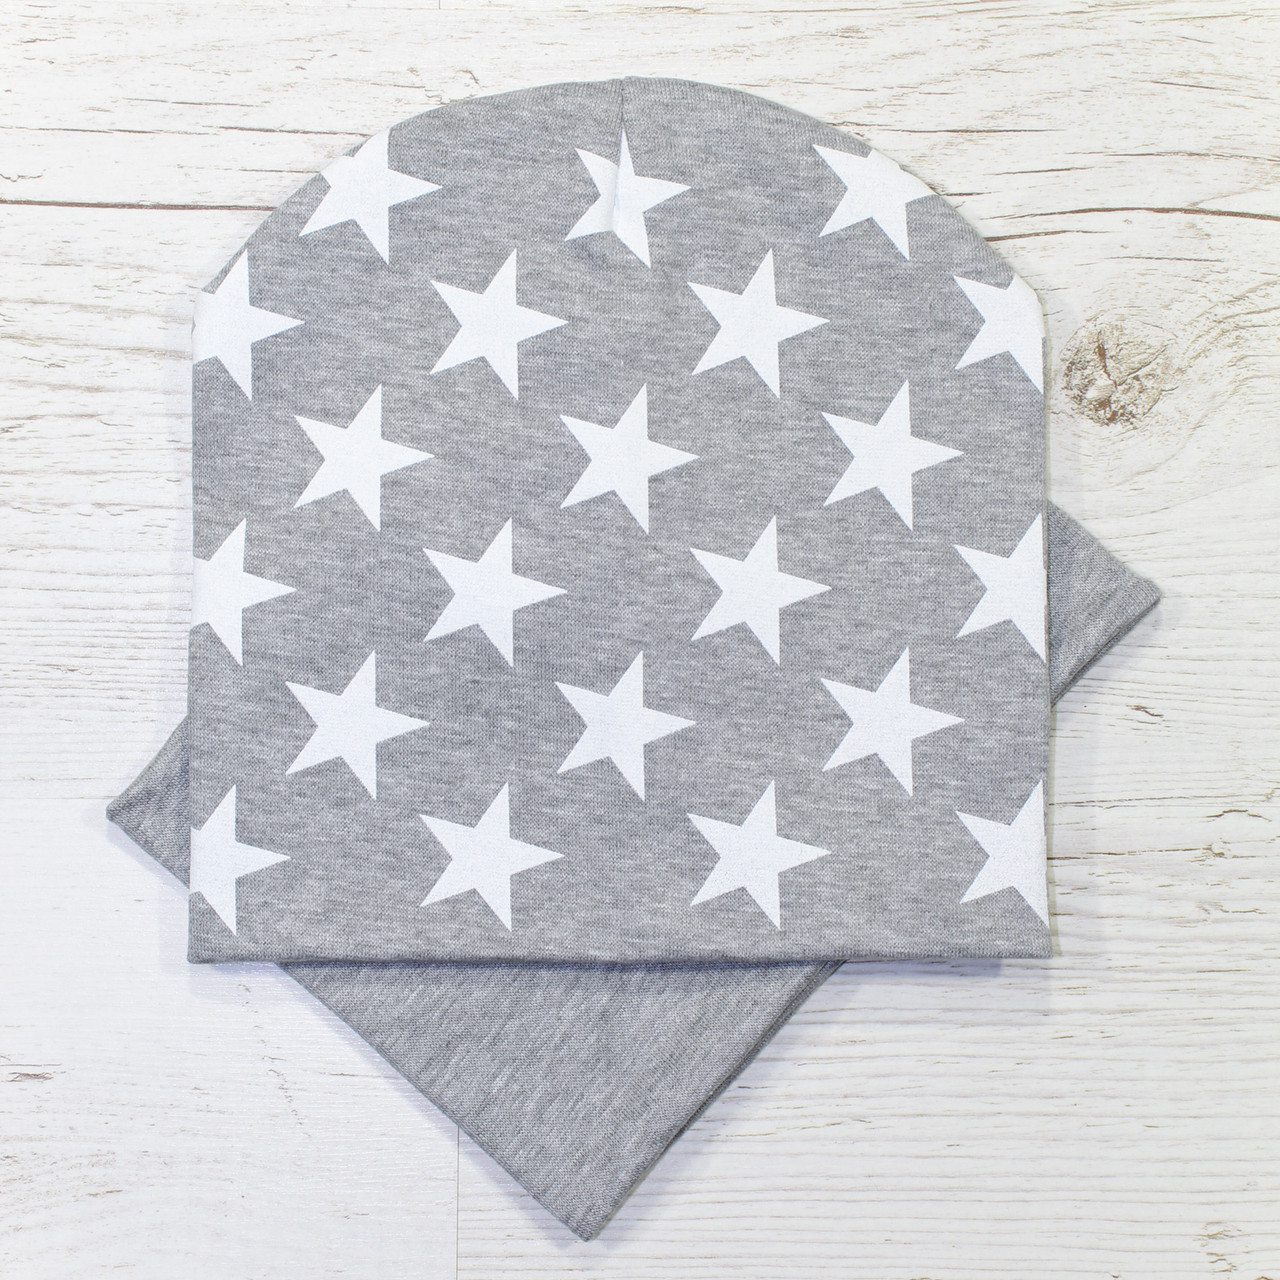 Весенняя детская трикотажная шапка комплект серый меланж 52-56р.